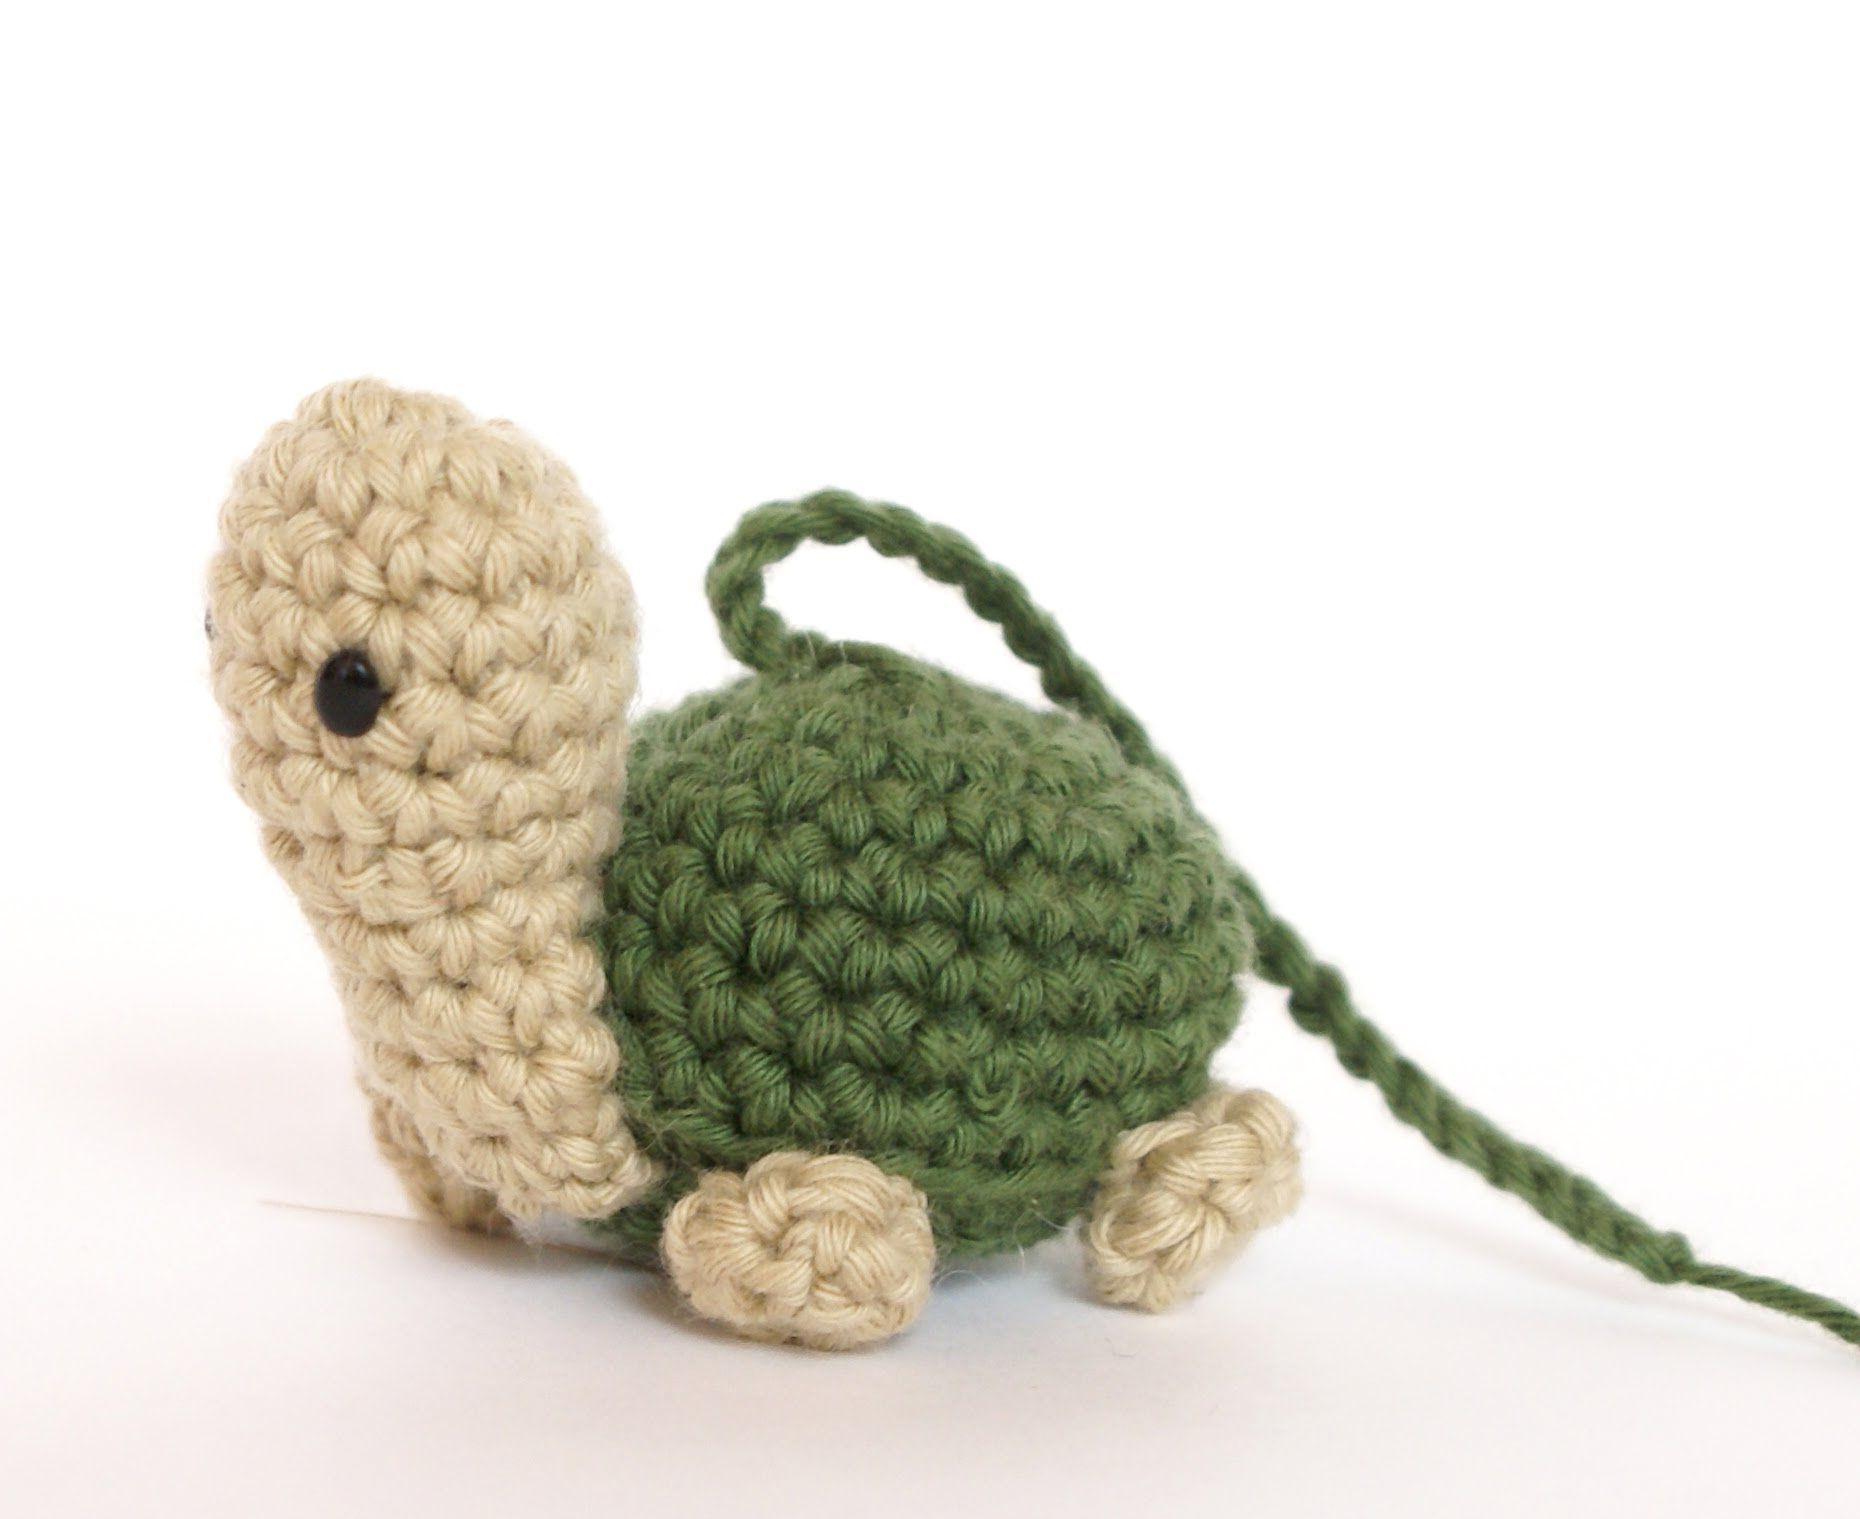 Amigurumi Duck Tutorial : Tutorial mini tortuga amigurumi turtle english subtitles